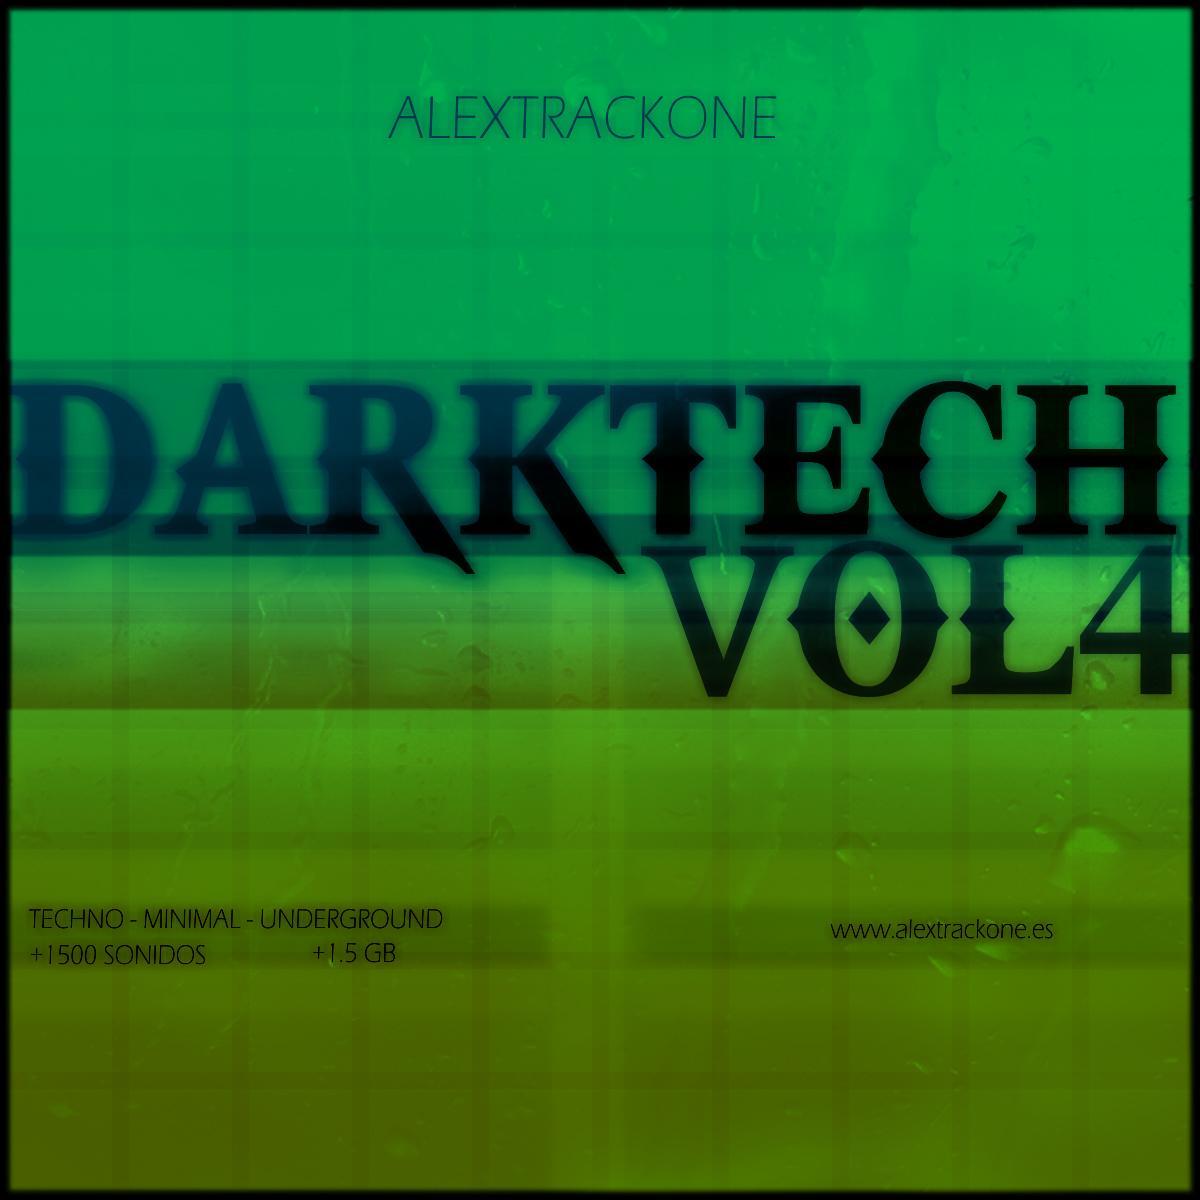 DarkTech Vol 4 -Samples Wav-